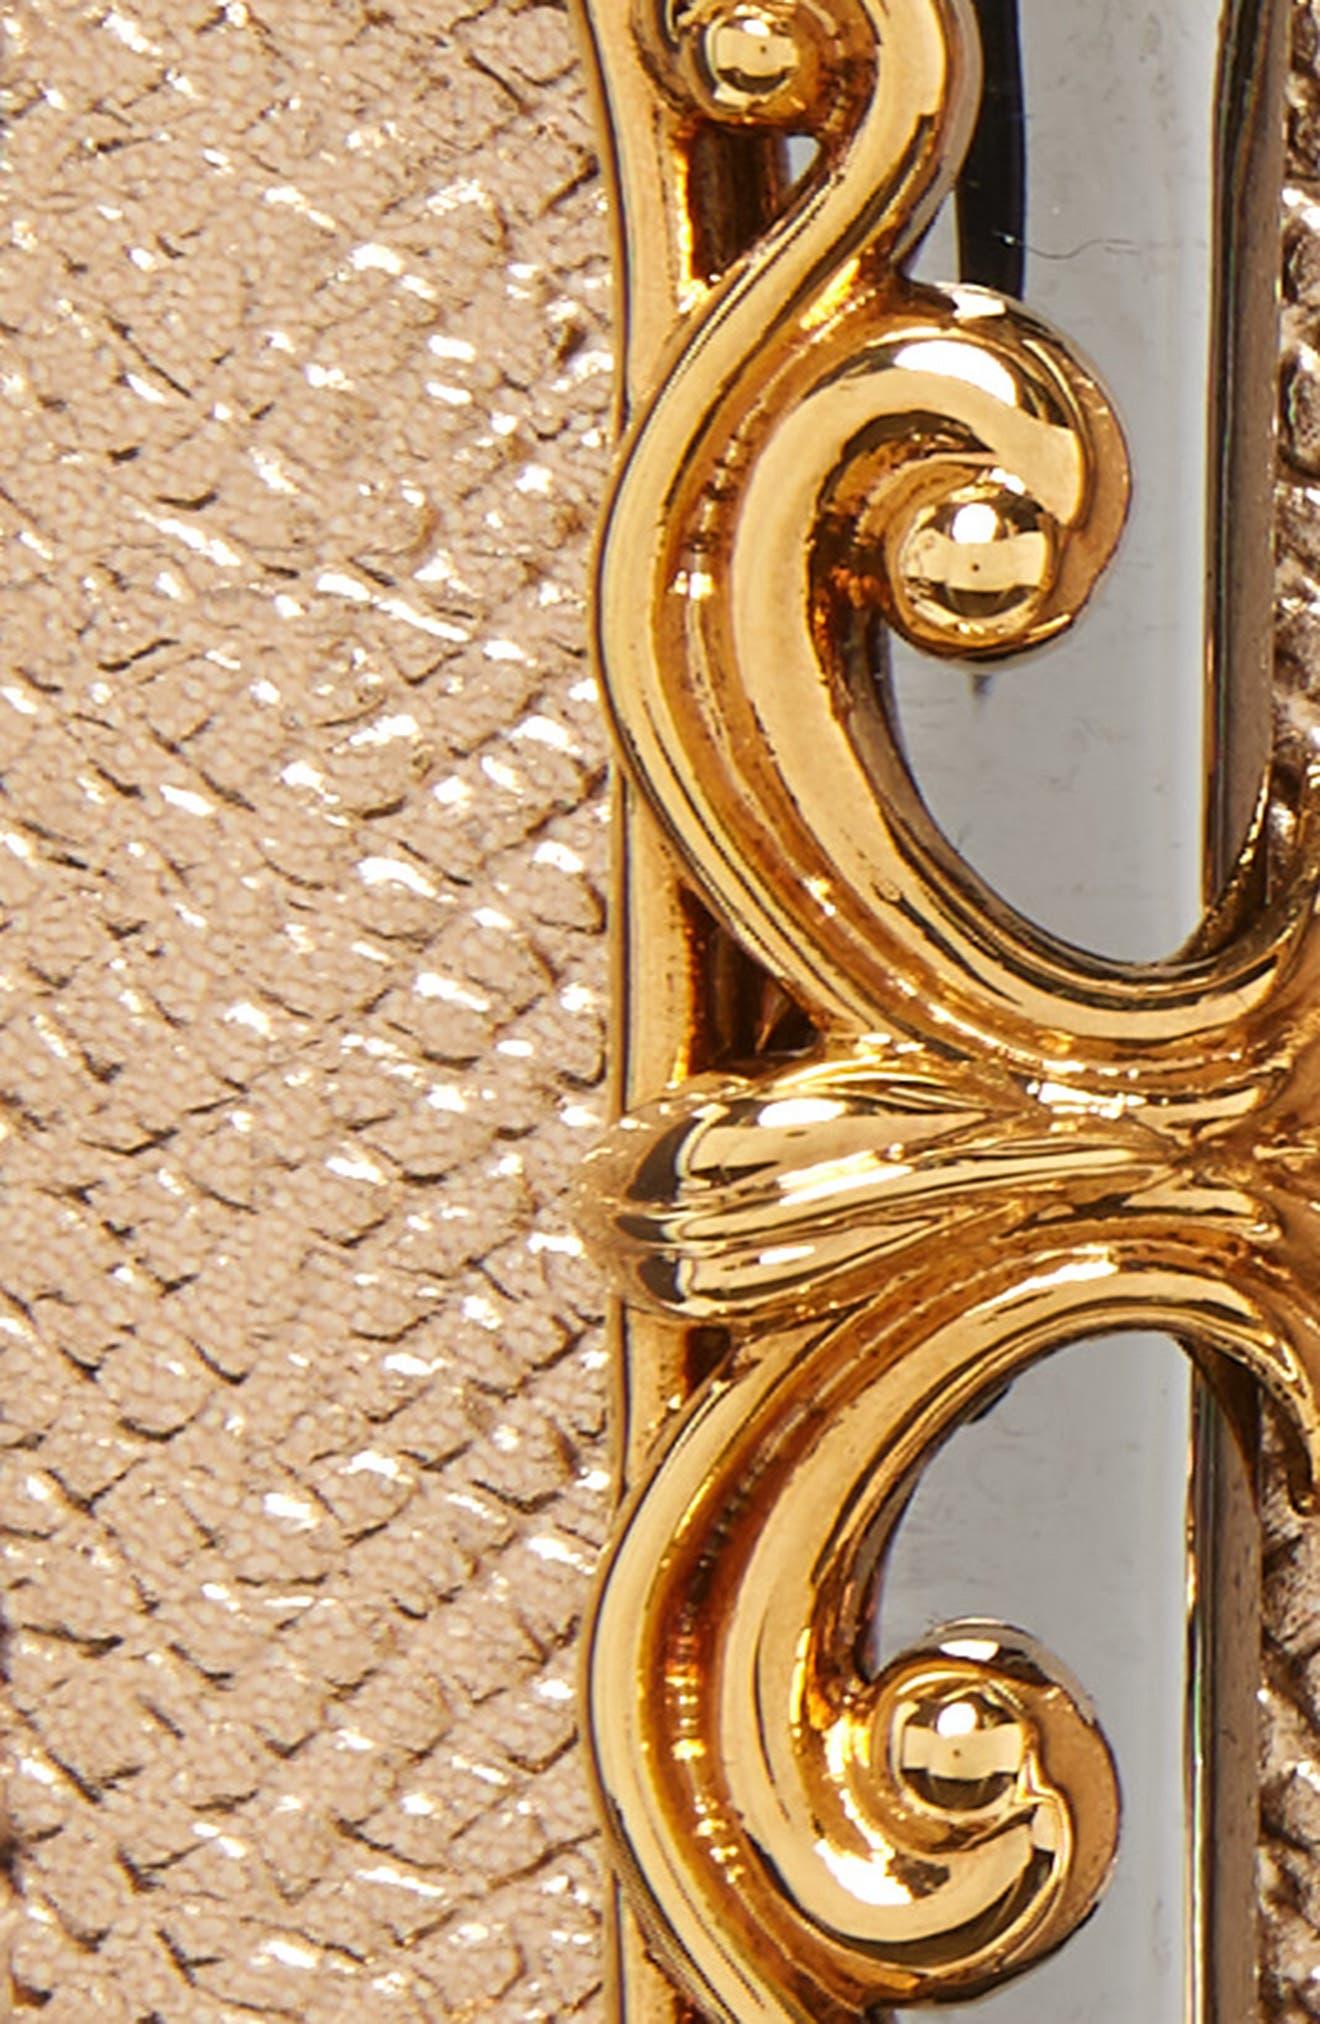 DOLCE&GABBANA,                             DG Baroque Metallic Calfskin Leather Belt,                             Alternate thumbnail 3, color,                             719